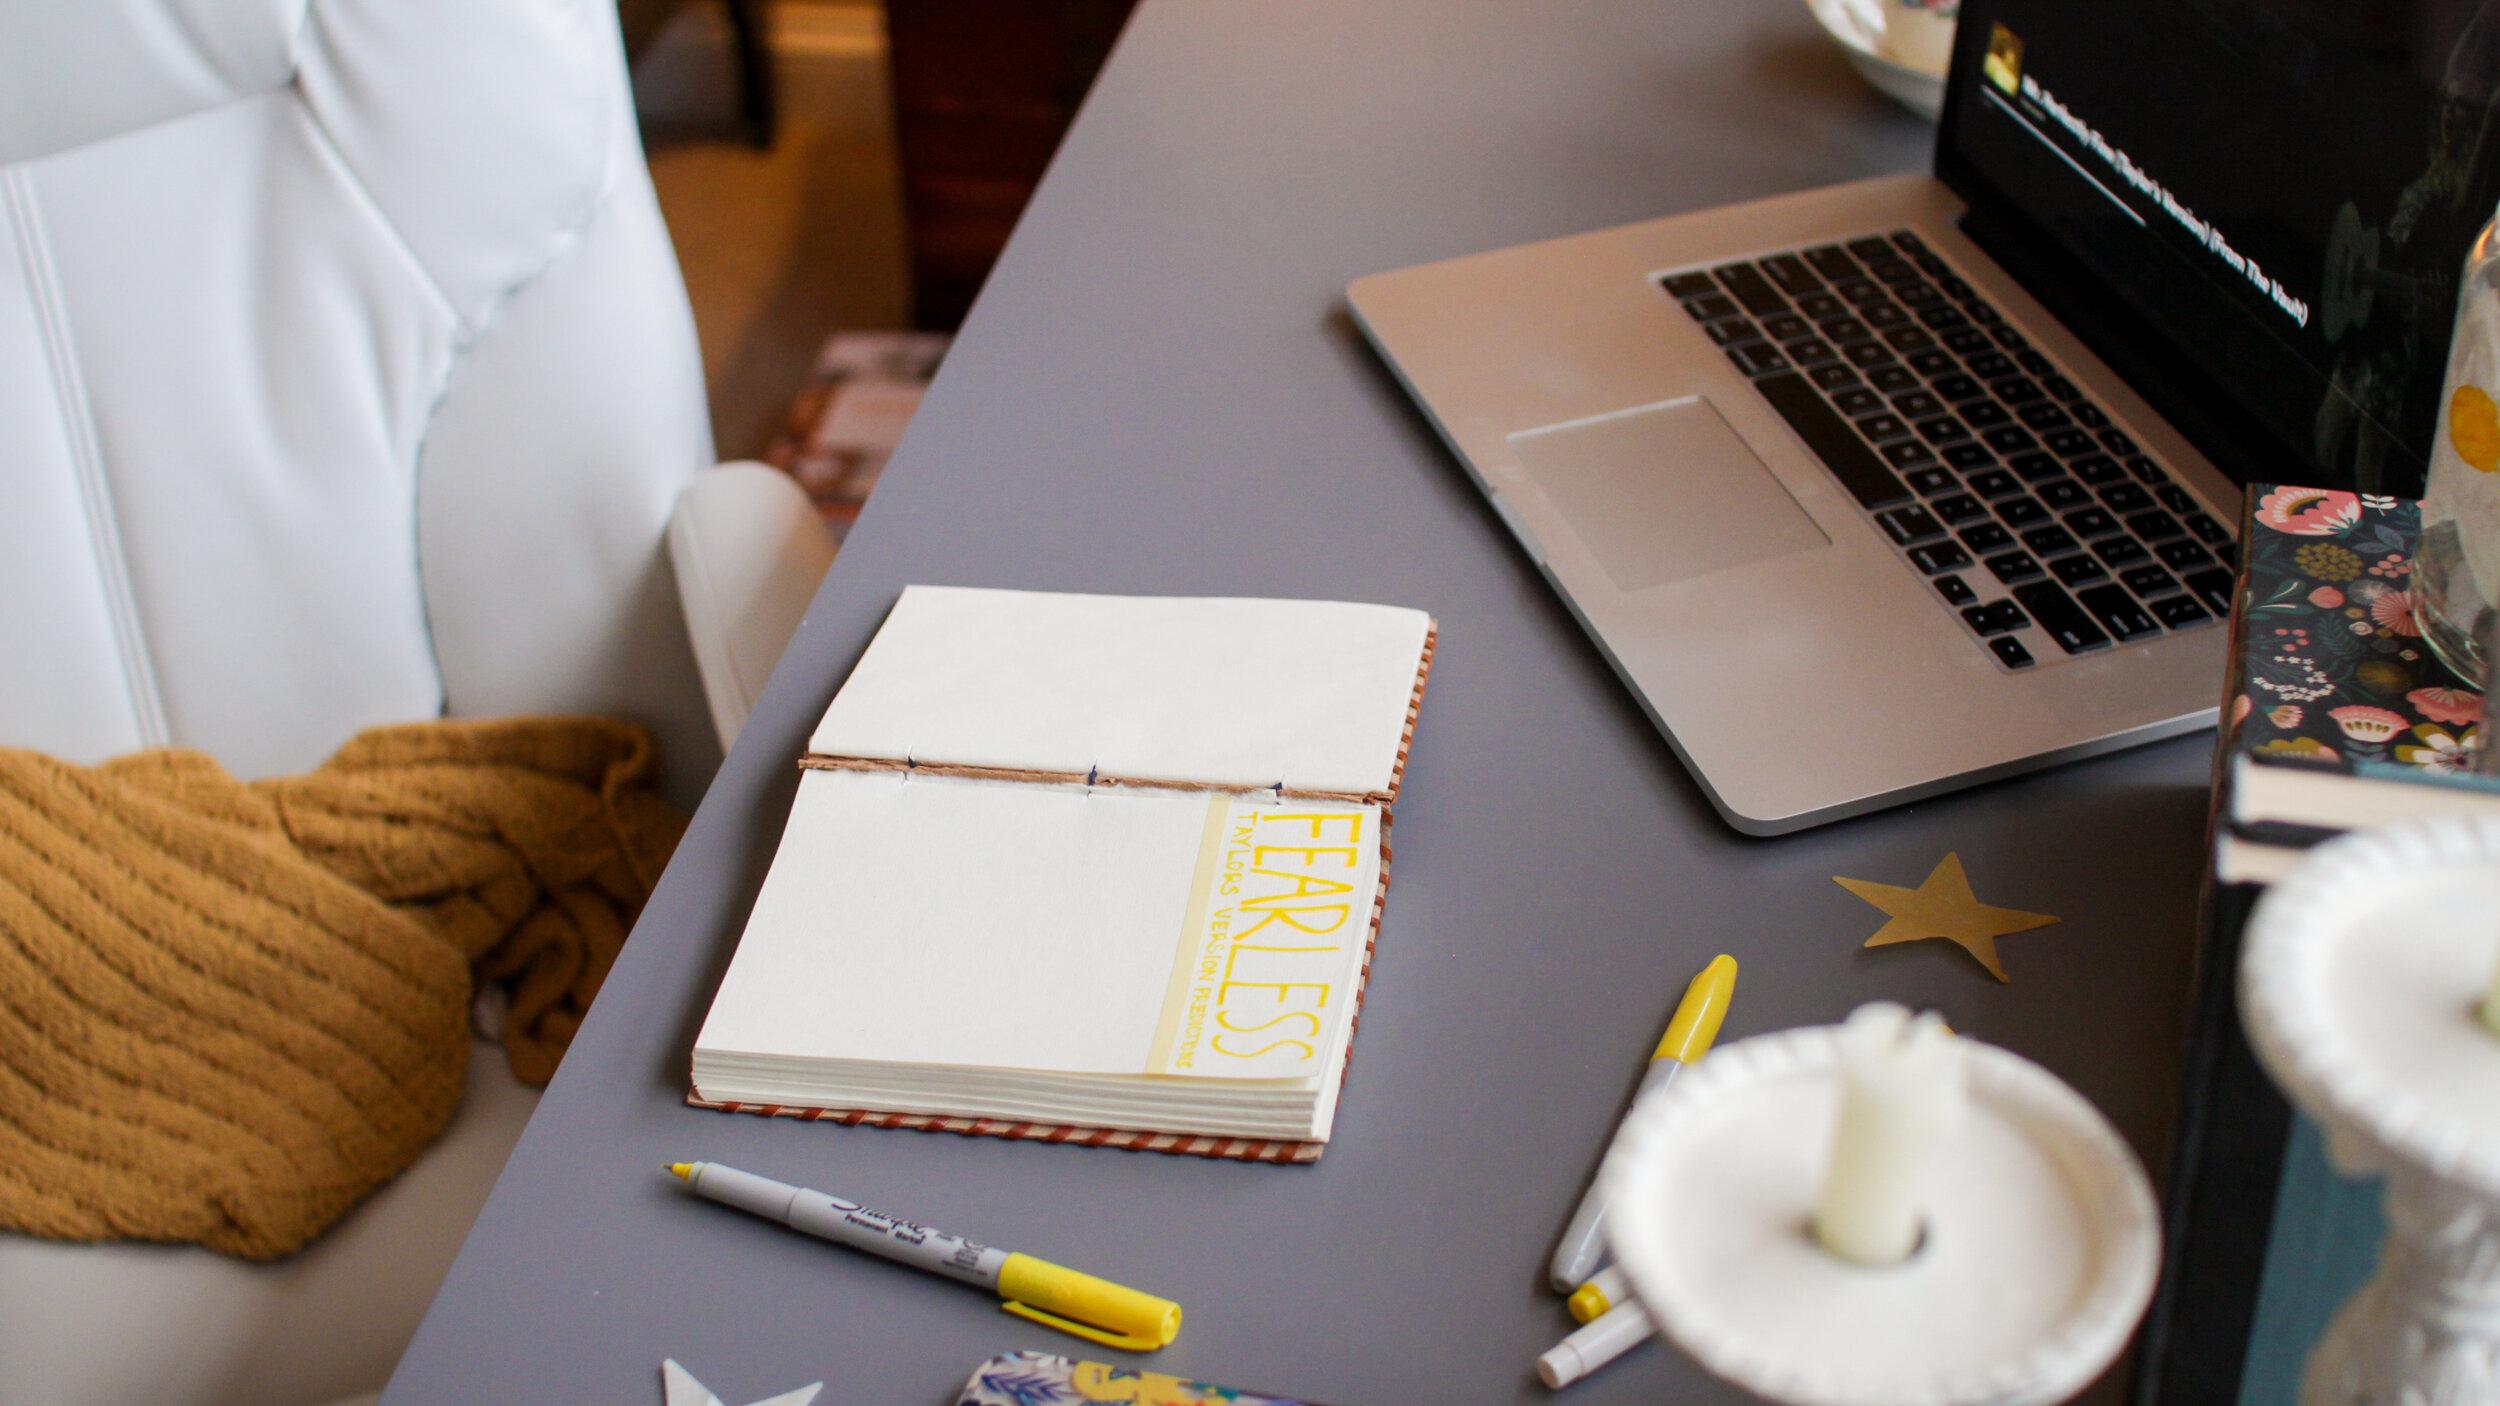 Desk aesthetic styling